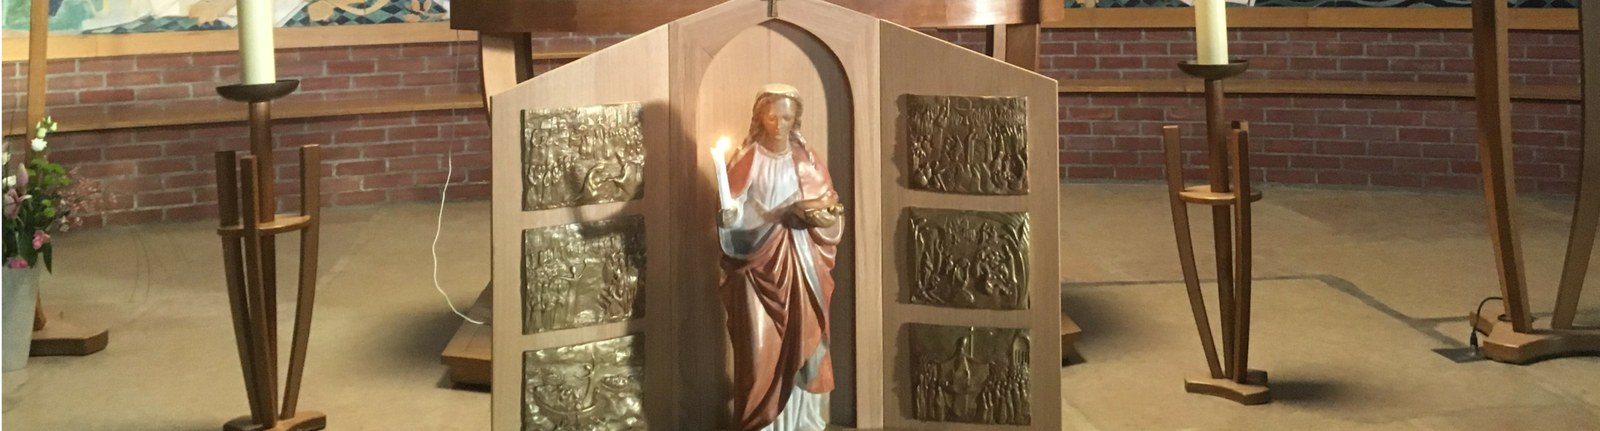 sainte-genevieve-patronne-du-diocese